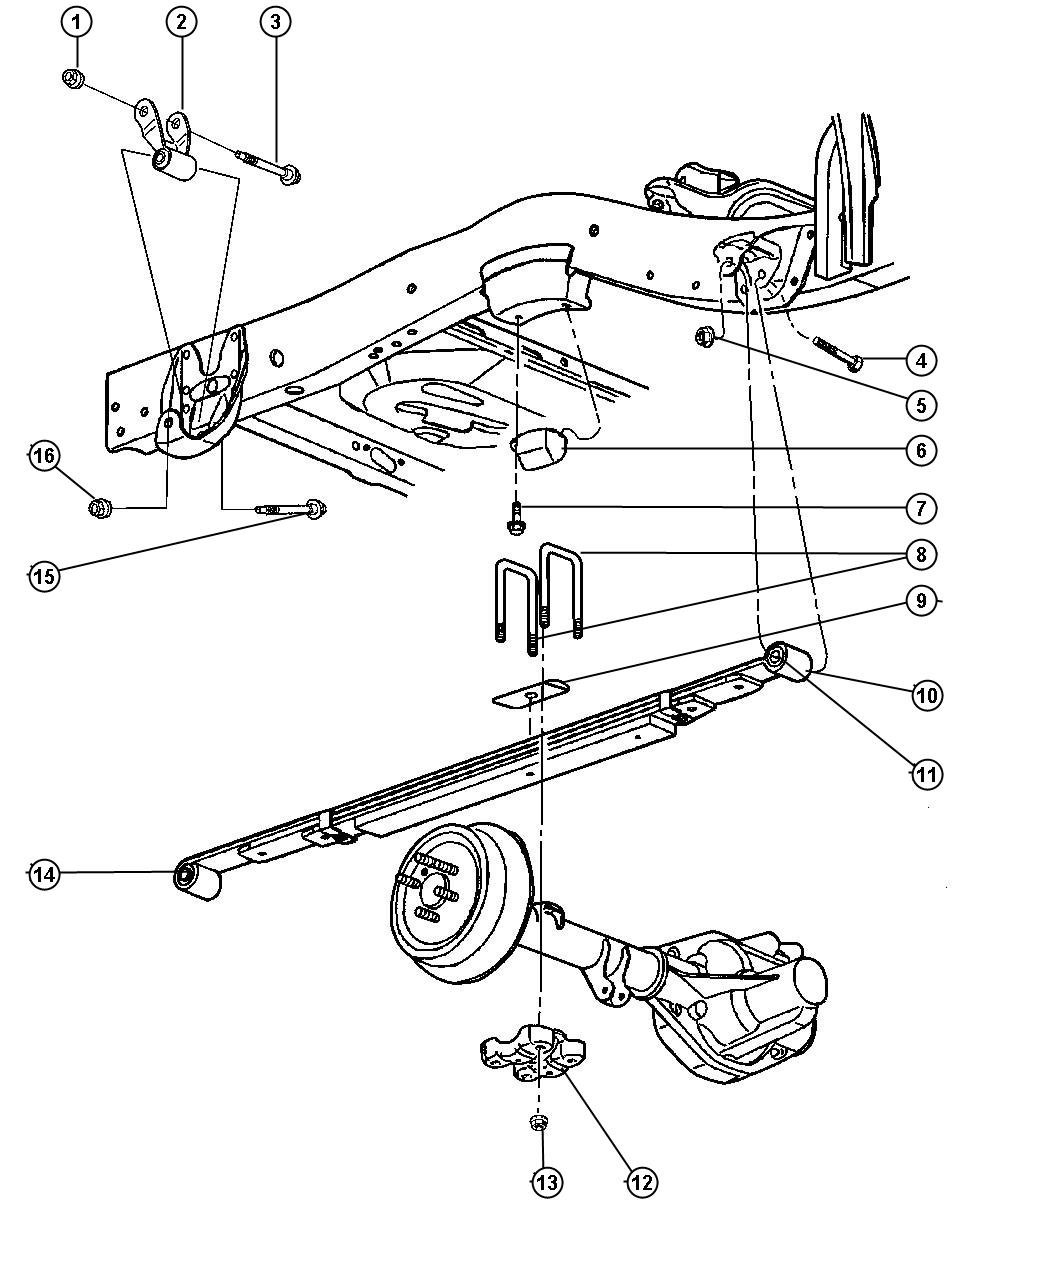 1998 Dodge Dakota Clip, u-bolt. Spring. Rear, drb